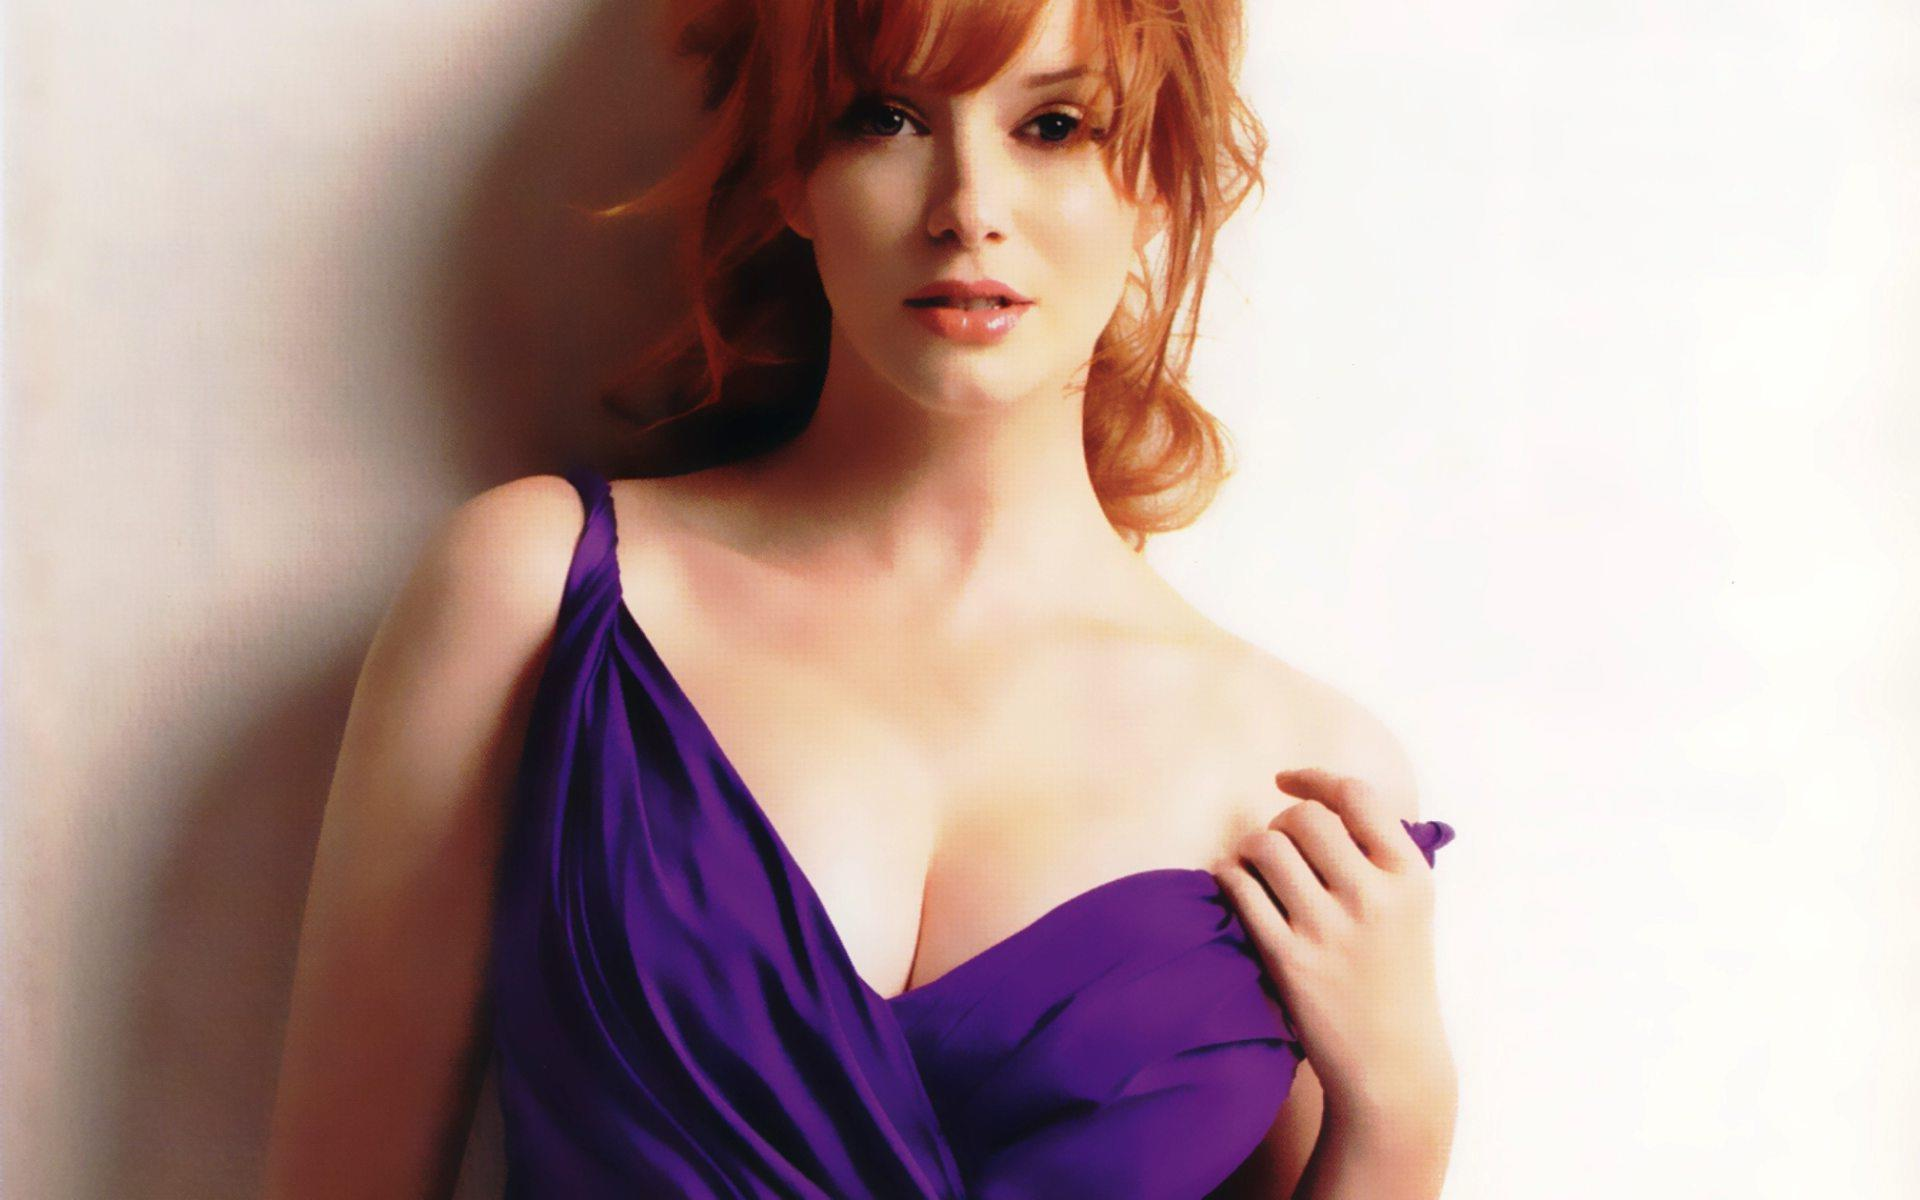 Christina Hendricks boobs CIY35V.jpg